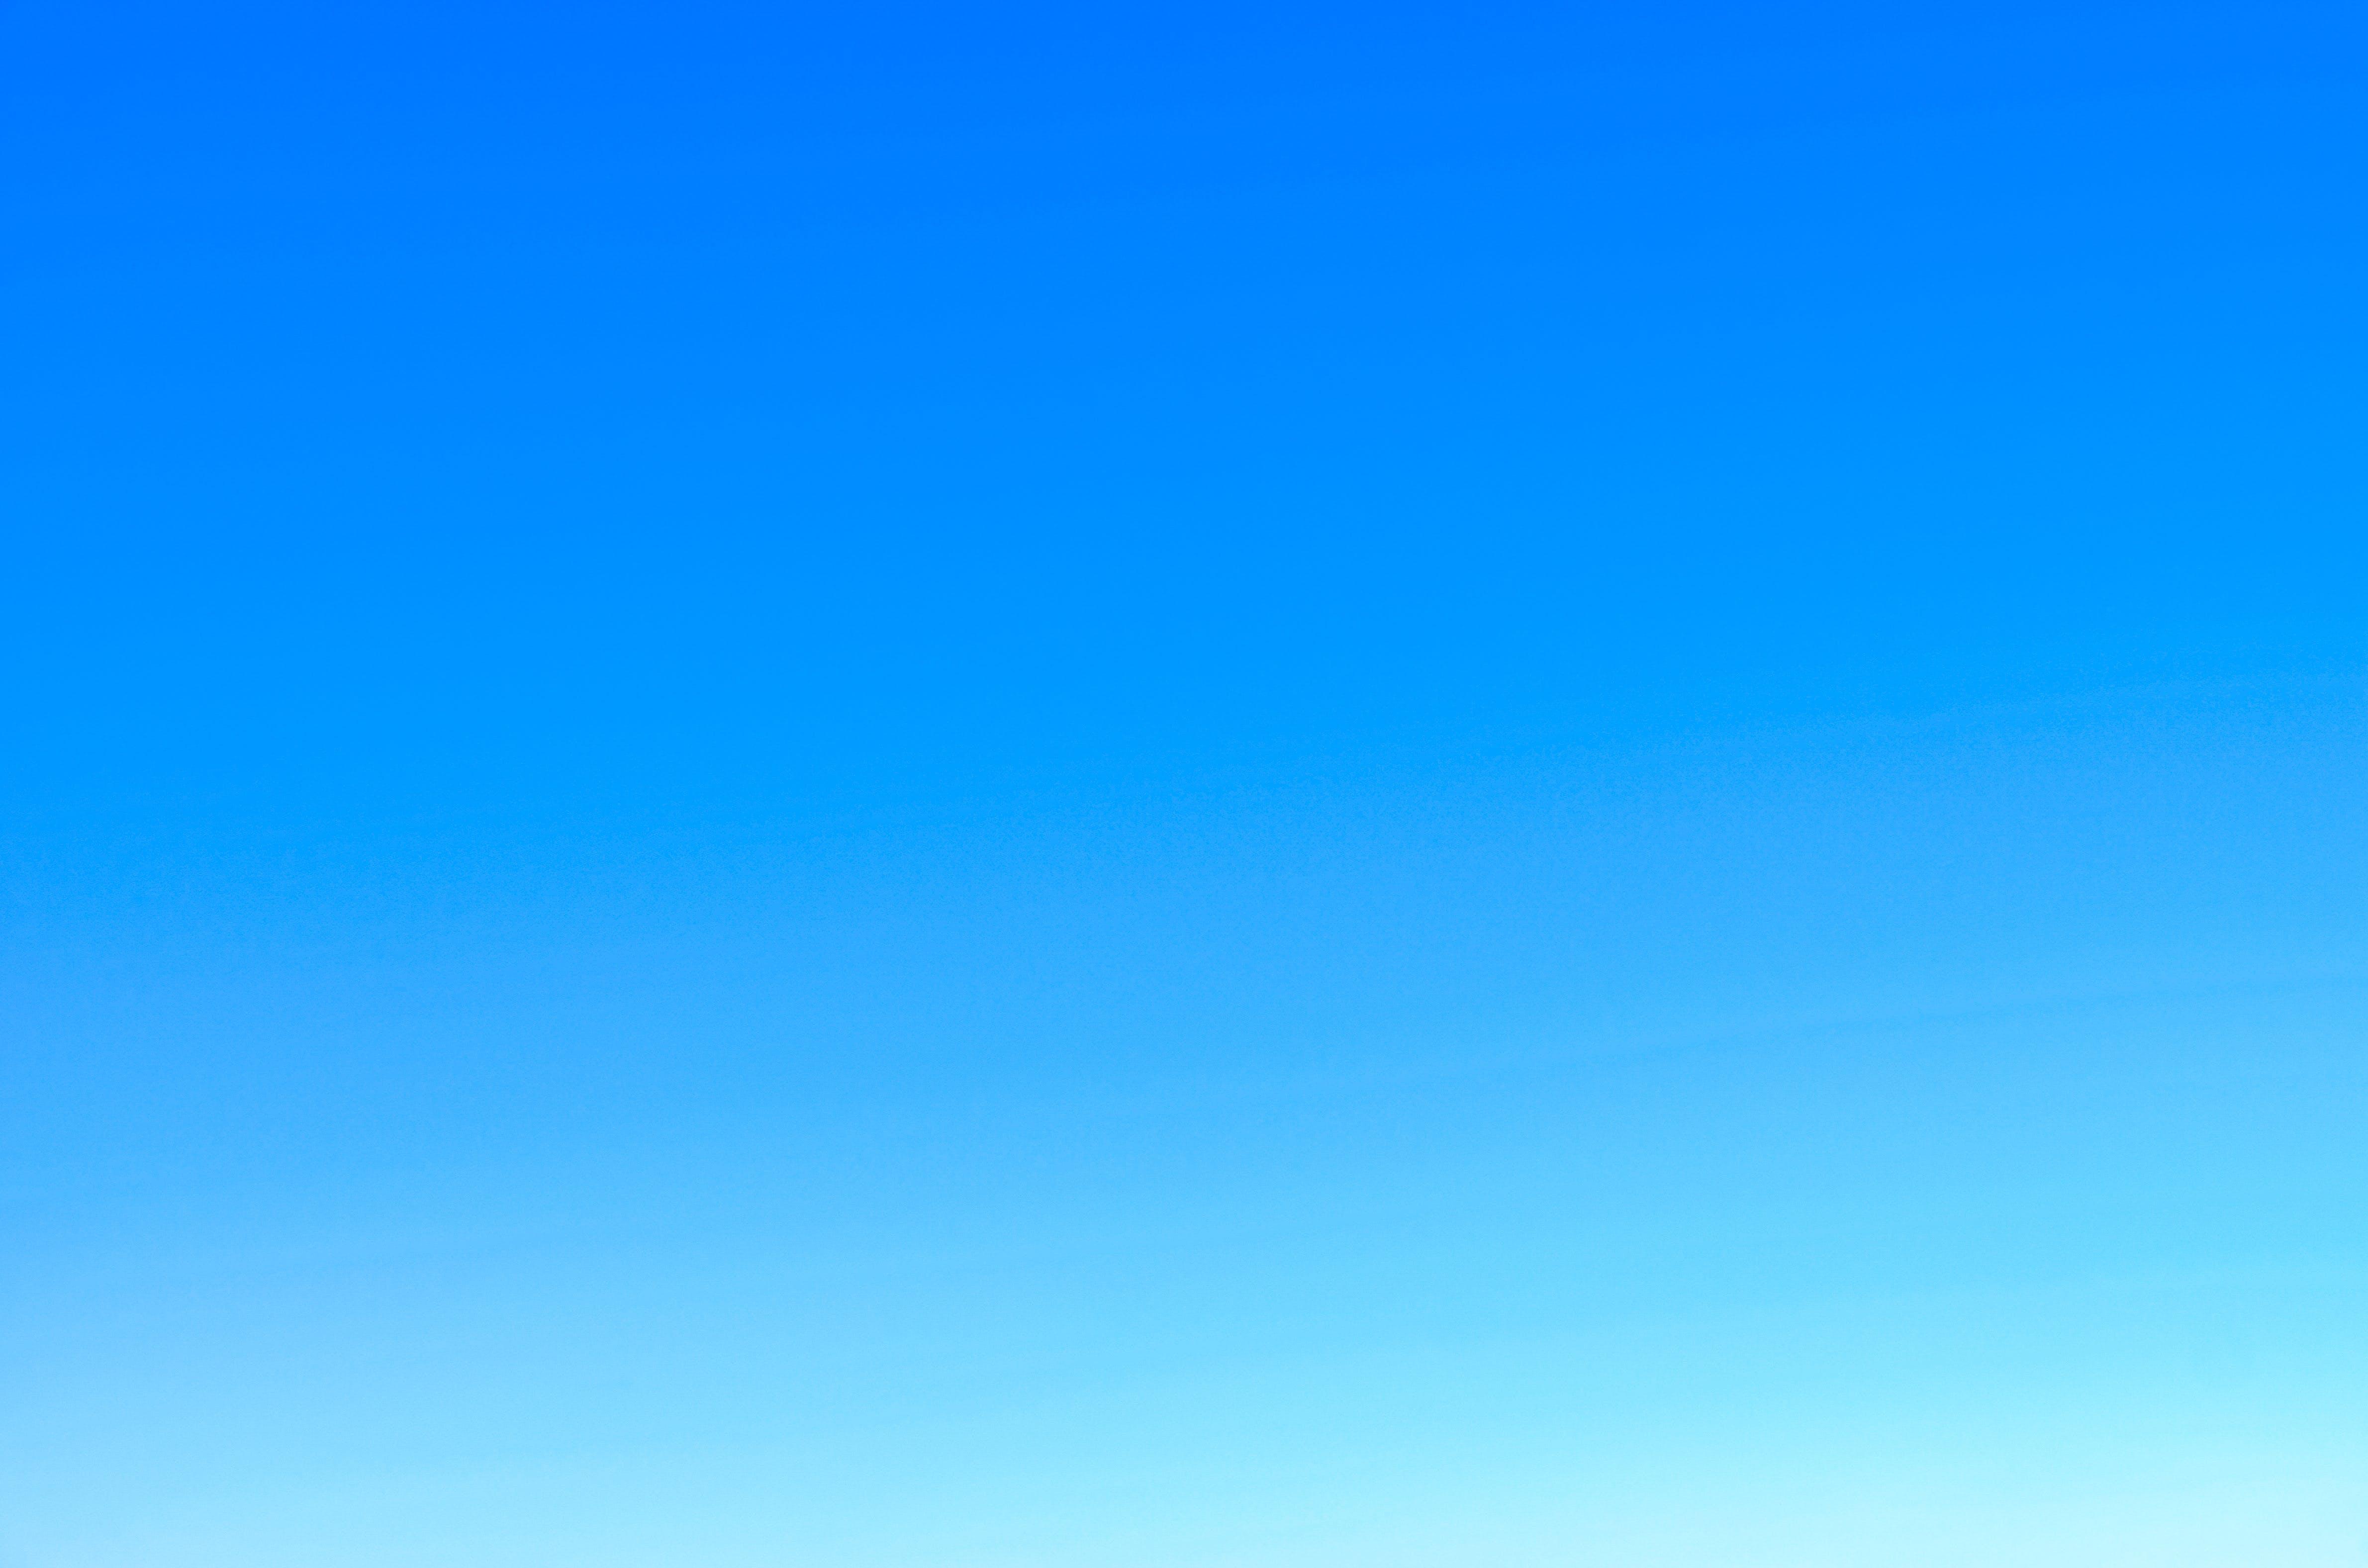 4k wallpaper, blauer himmel, farbe